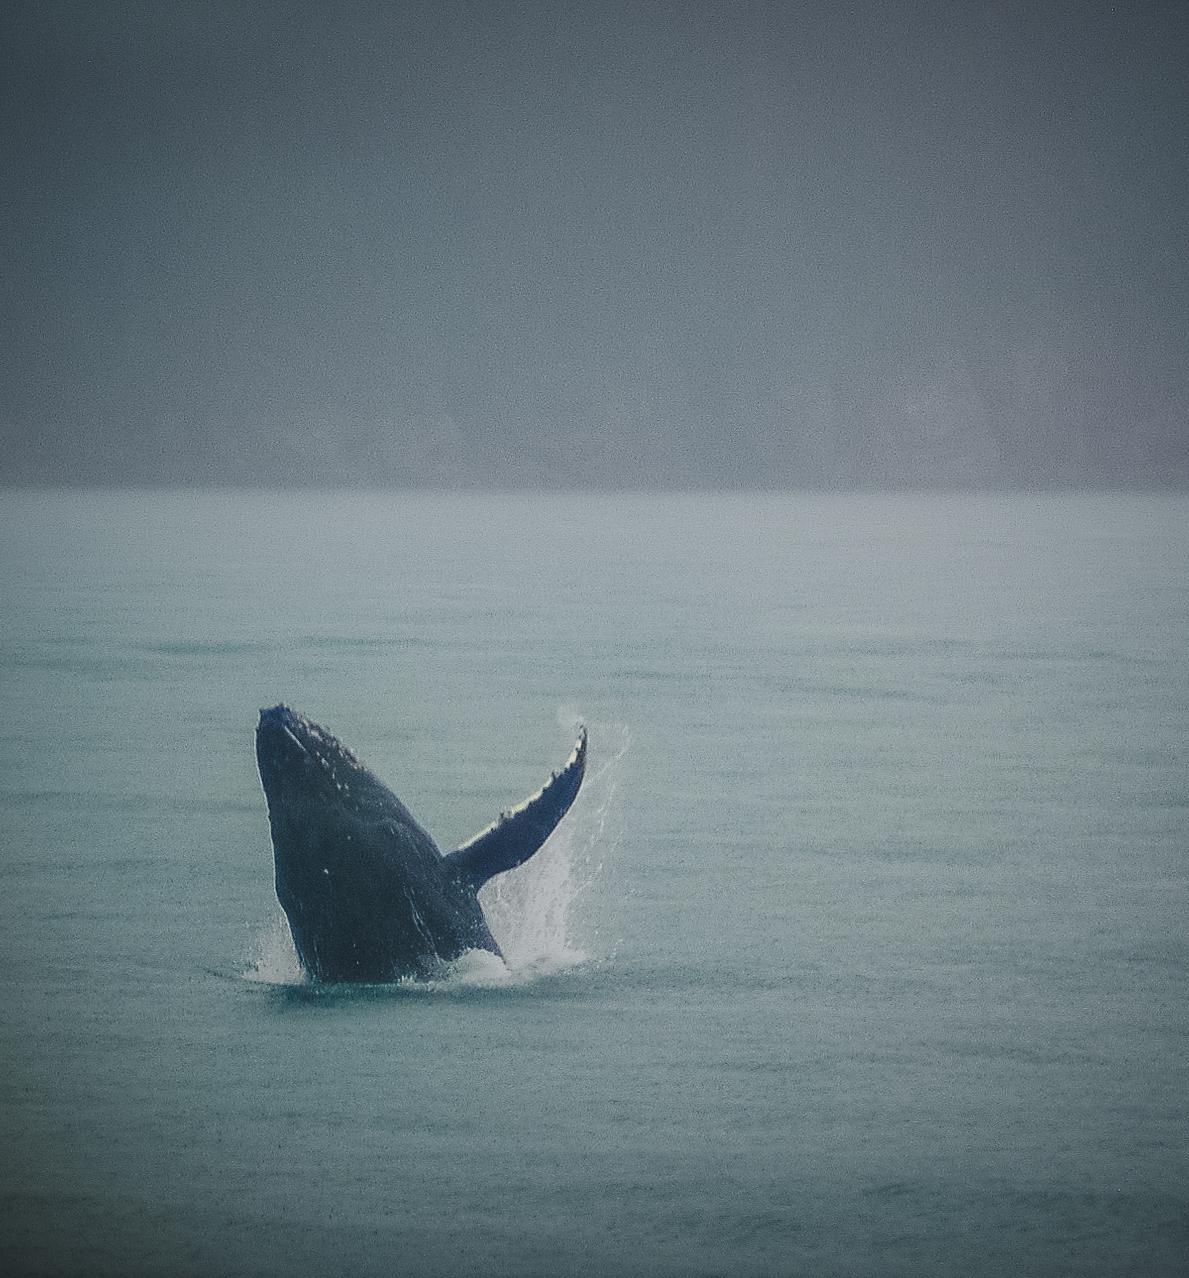 kenai_whale_crockett_2010.jpg